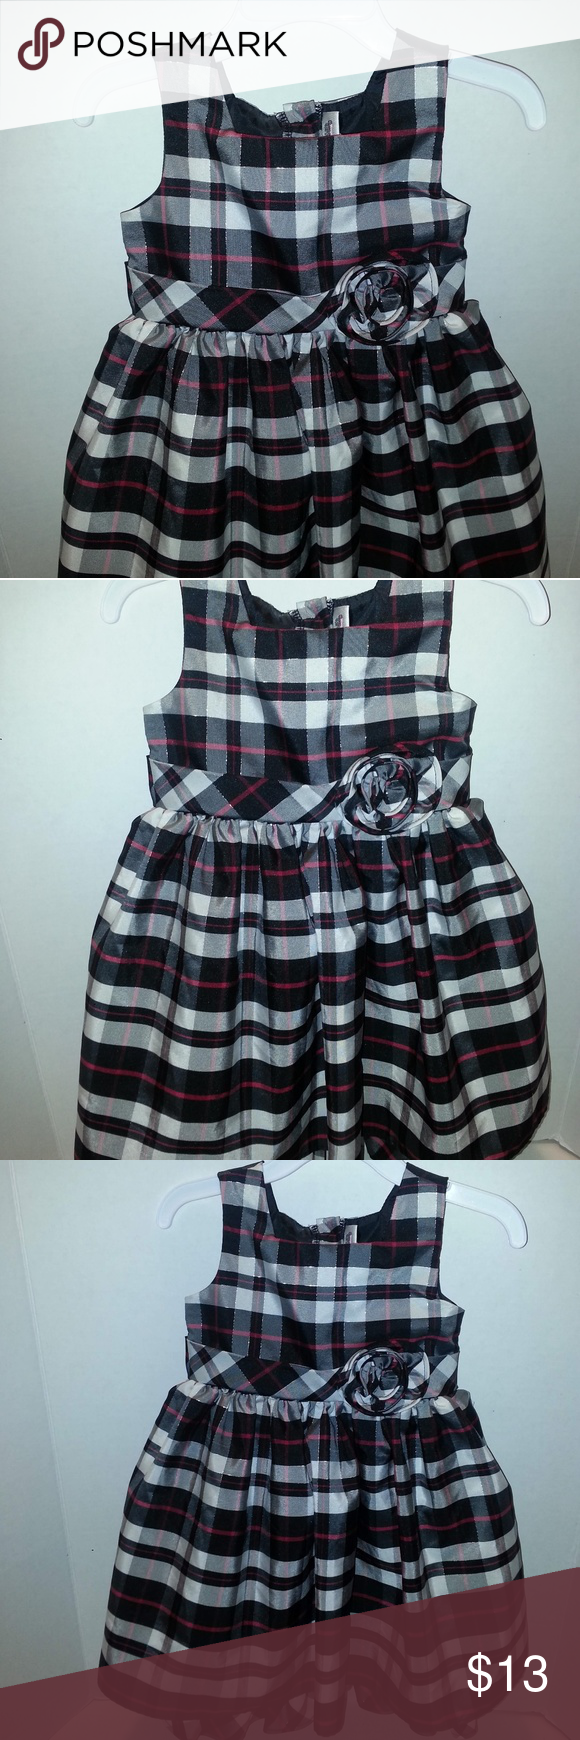 Youngland Toddler Girls Dress 2t Black White Toddler Girl Dresses Girls Dresses Toddler Girl [ 1740 x 580 Pixel ]